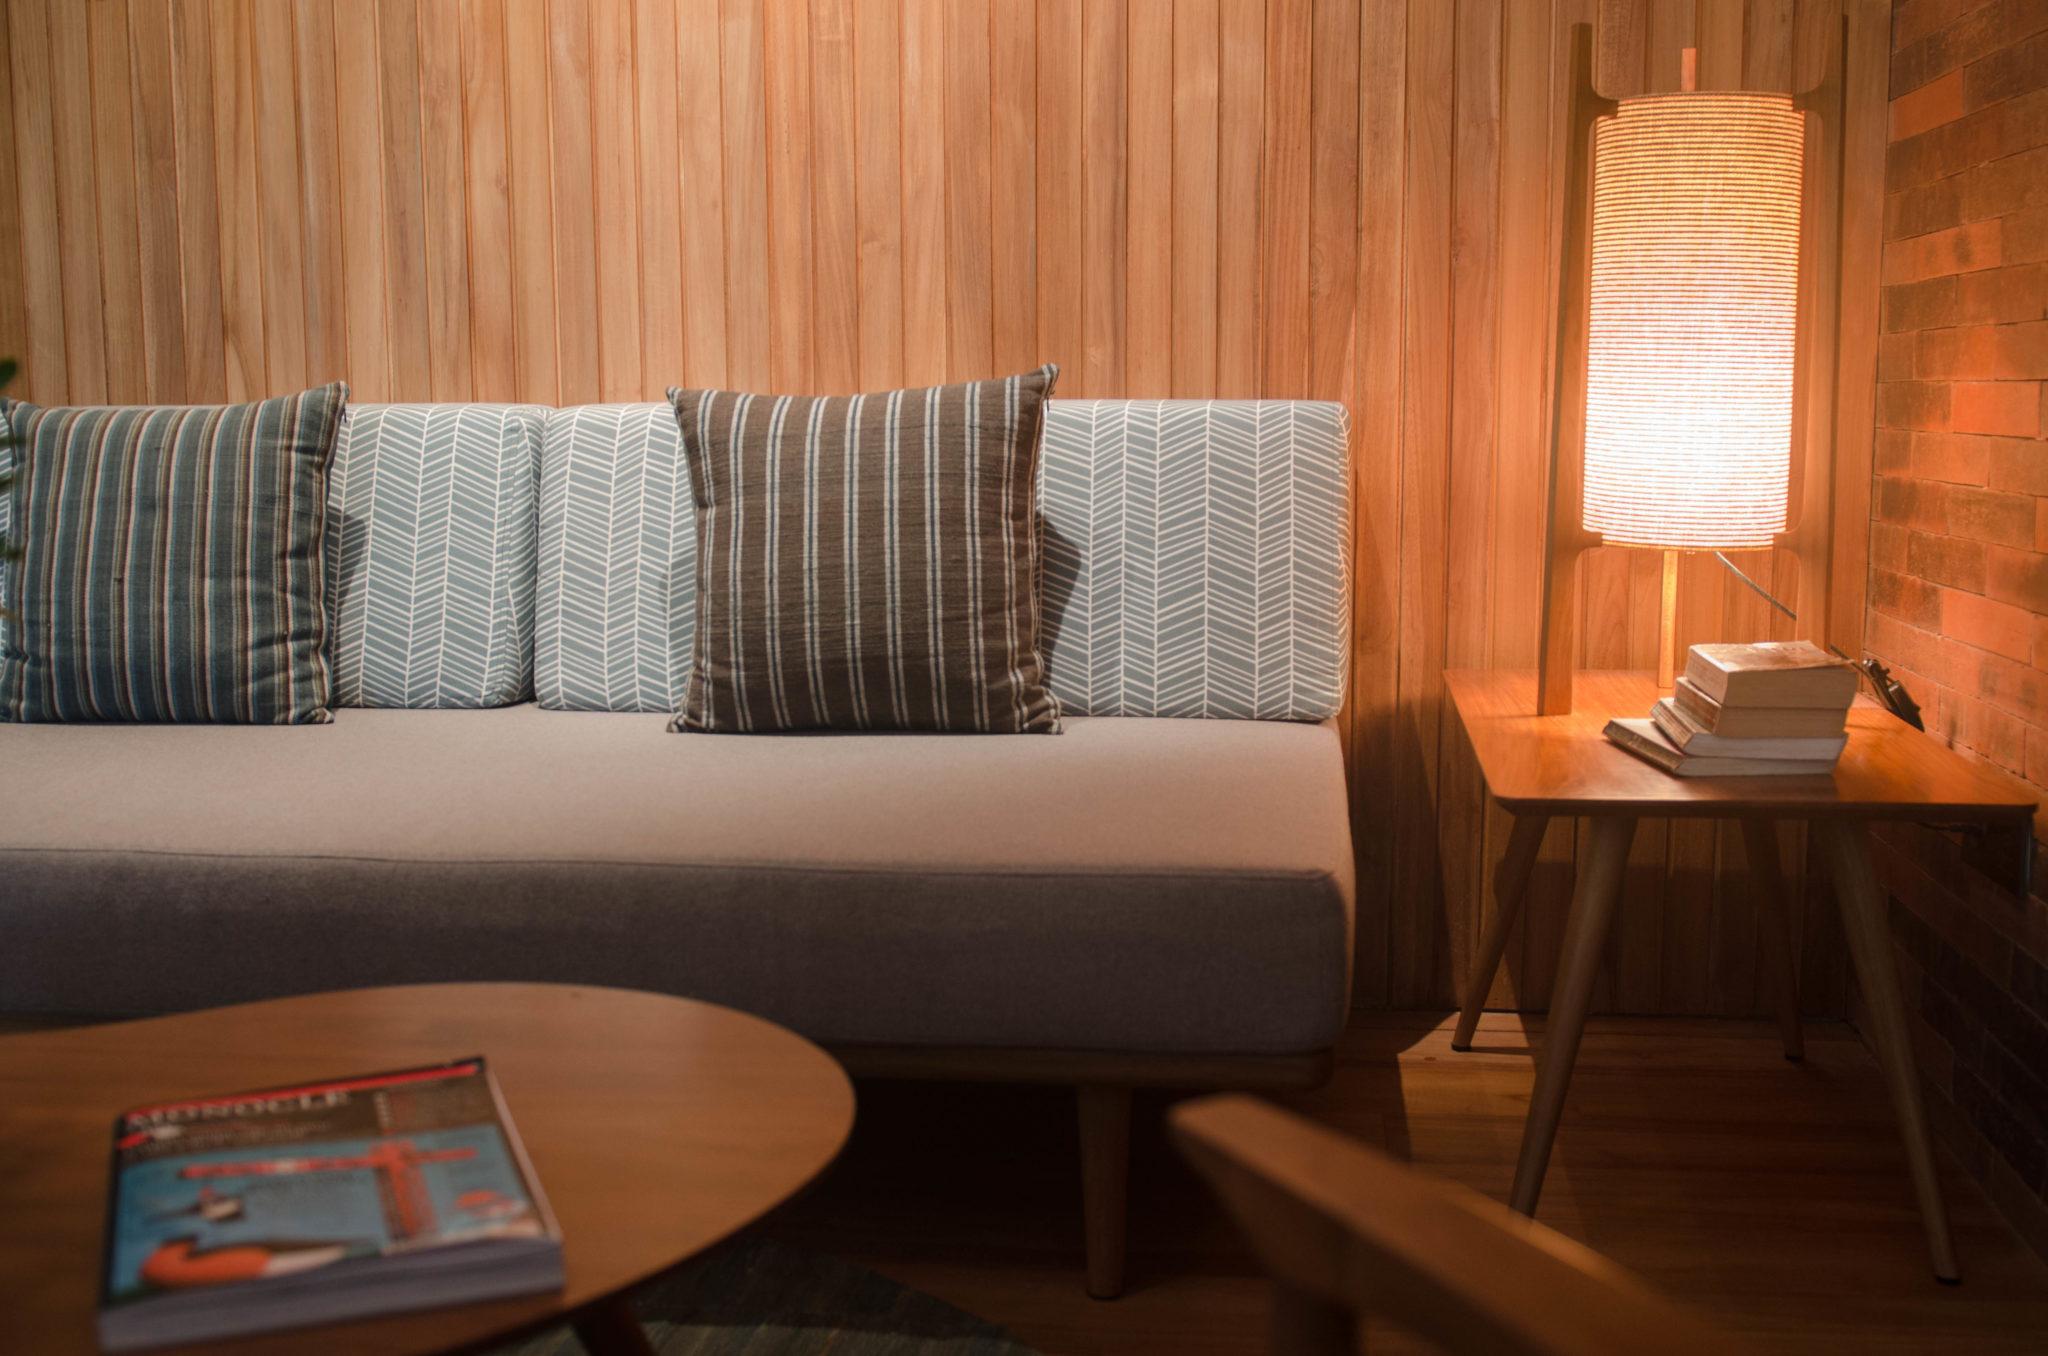 Katamama-Hotel-Bali-Seminyak-Kerobokan-Couch